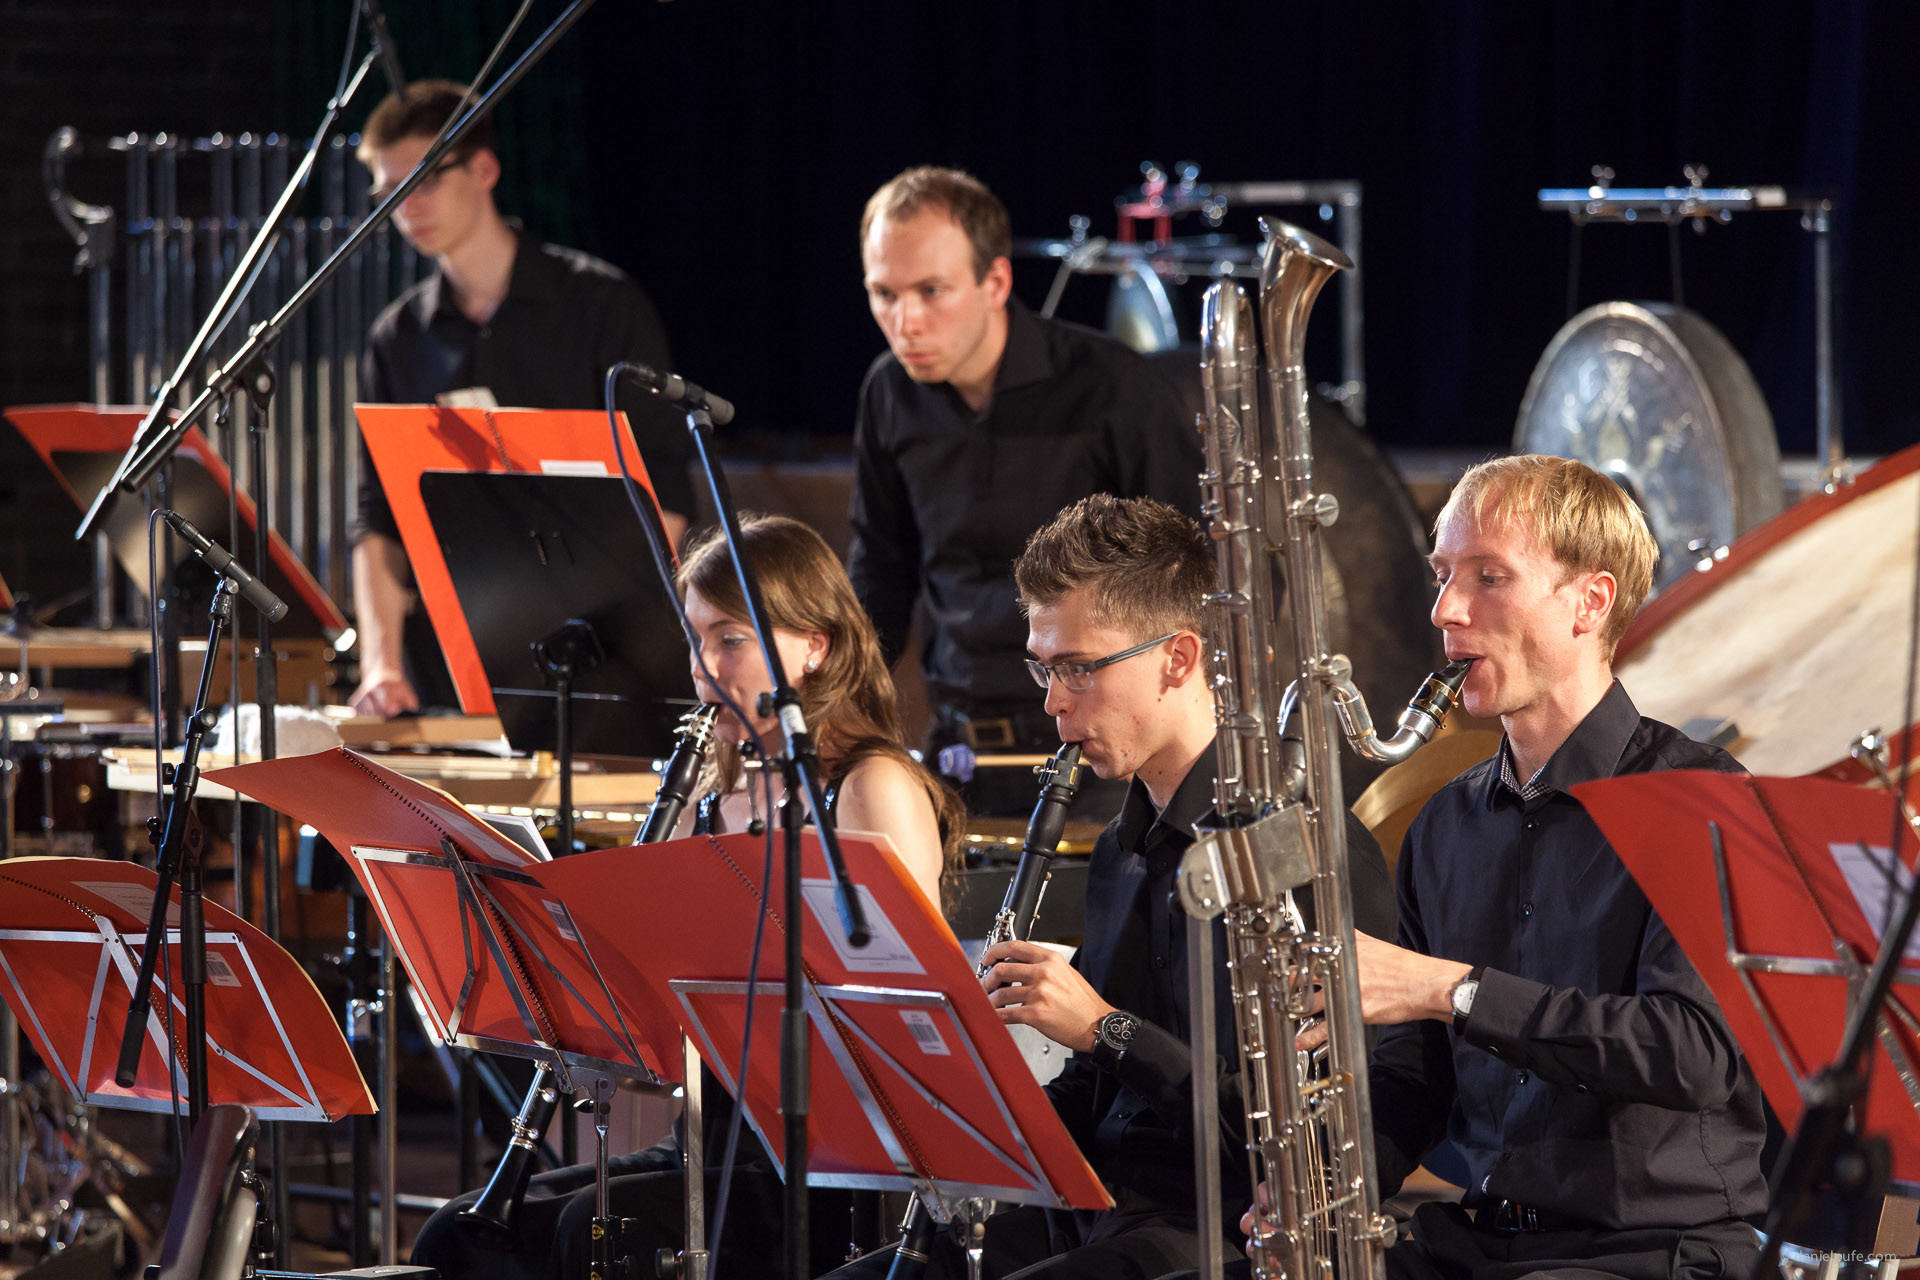 Workshop Concert: EWCM European Workshop for Contemporary Music